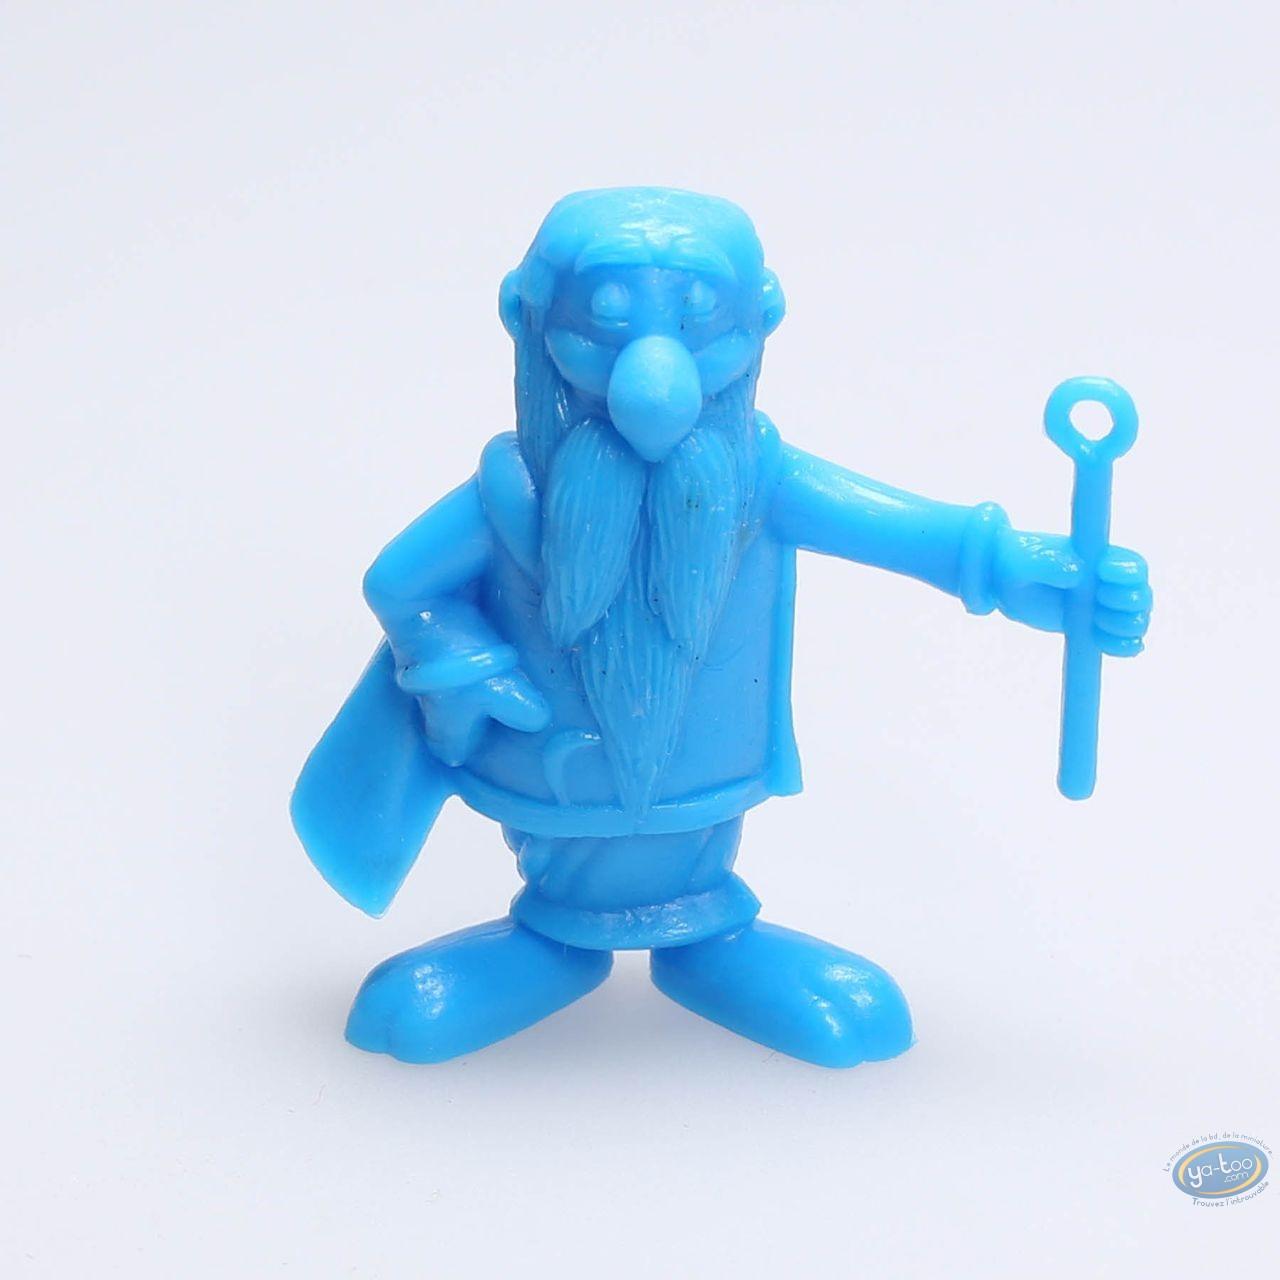 Figurine plastique, Astérix : Mini Panoramix (bleu)